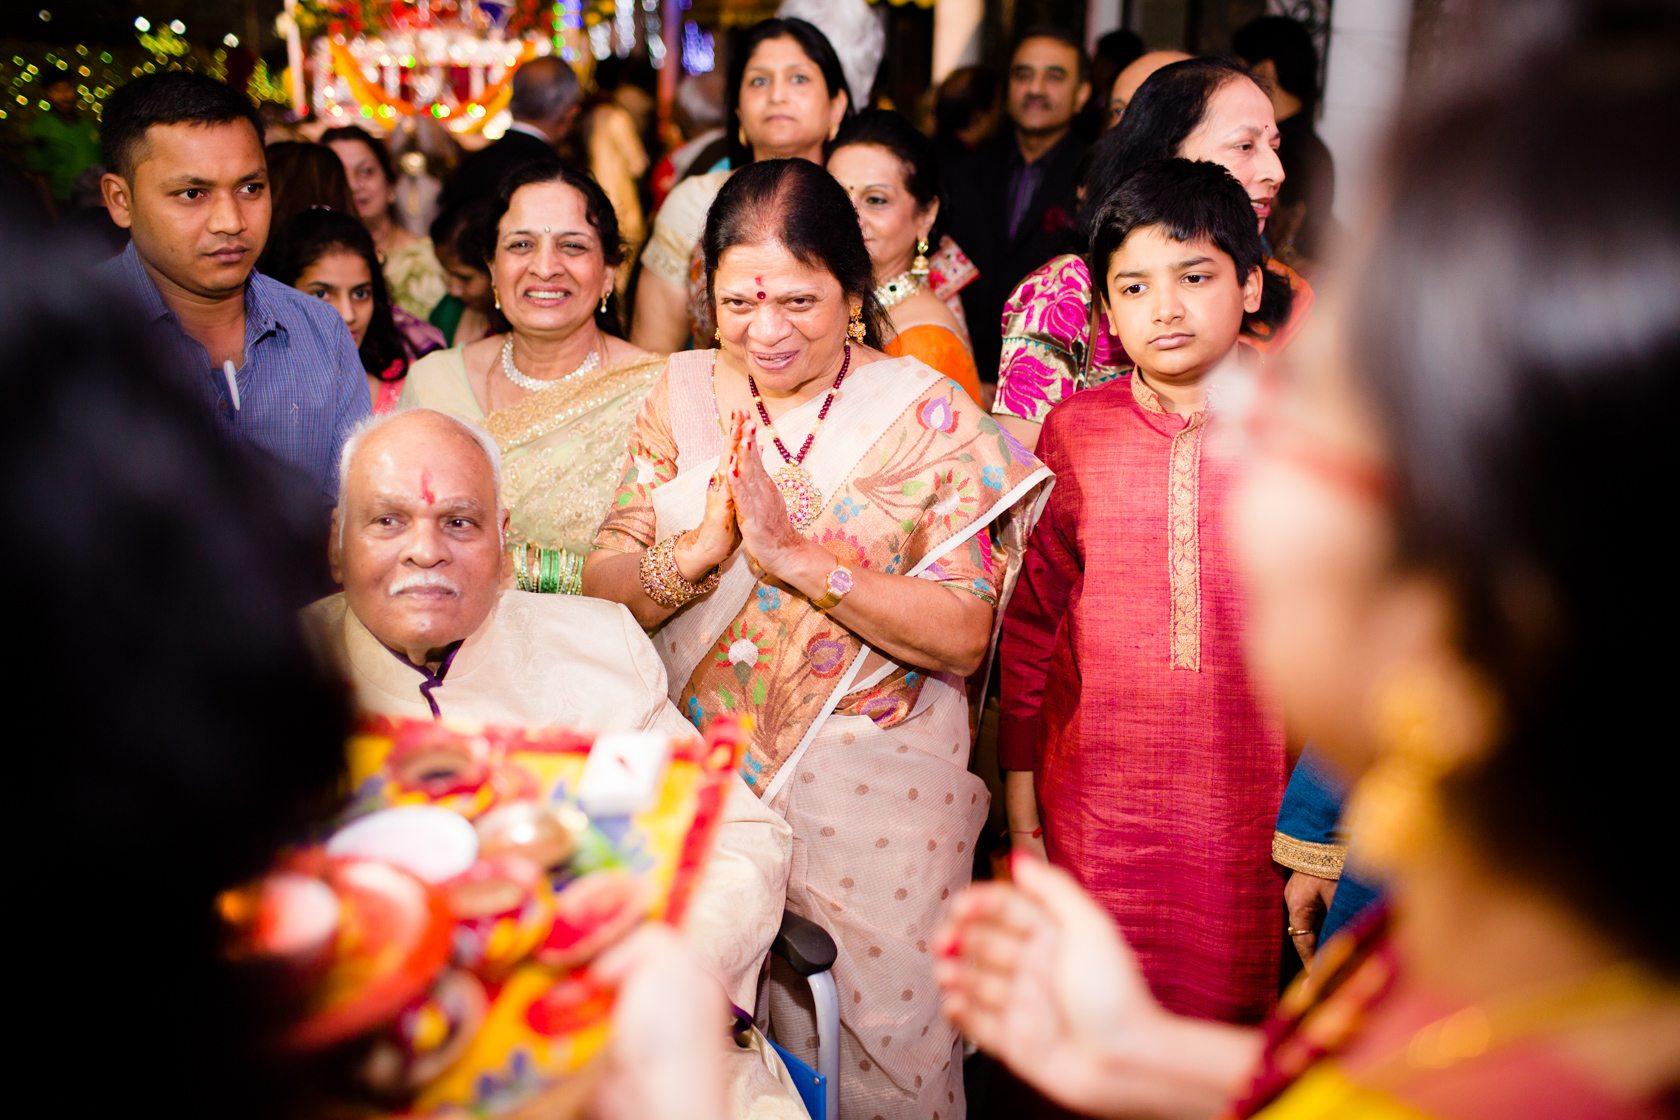 India_Wedding_128.jpg